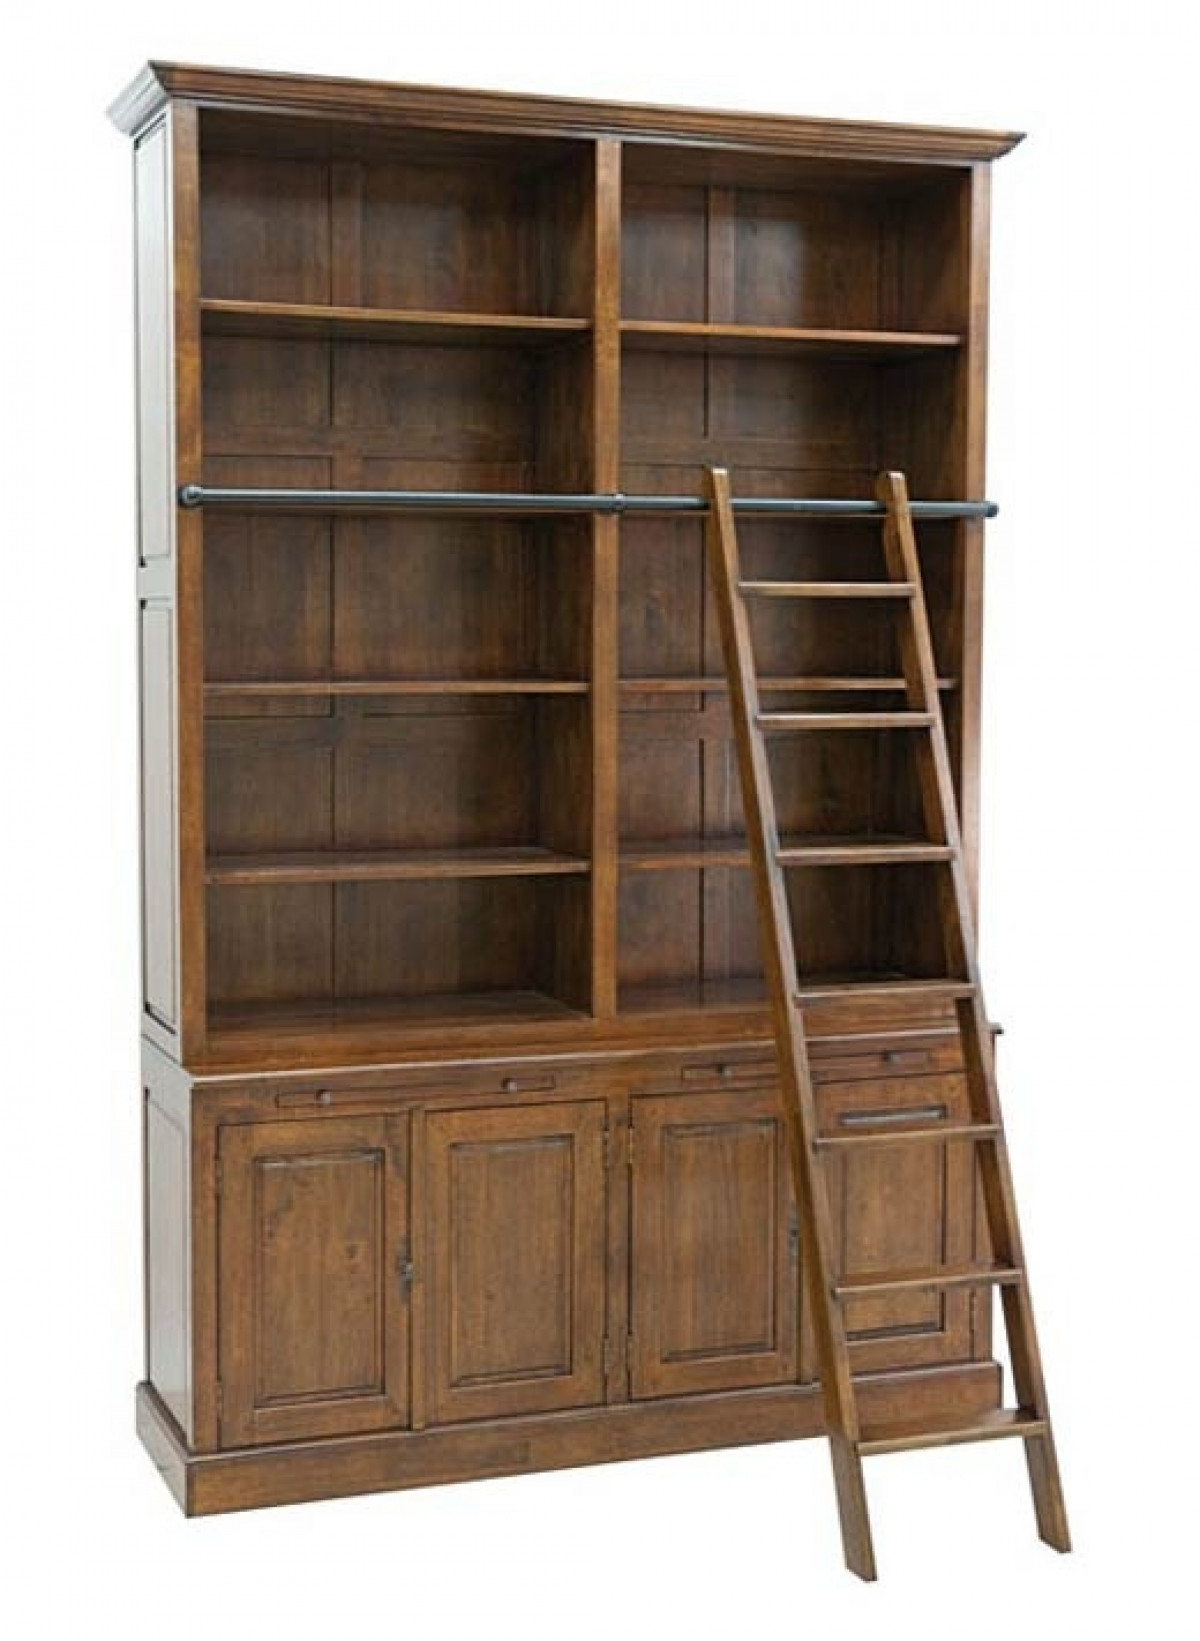 arnold grande bibliotheque avec echelle bois massif